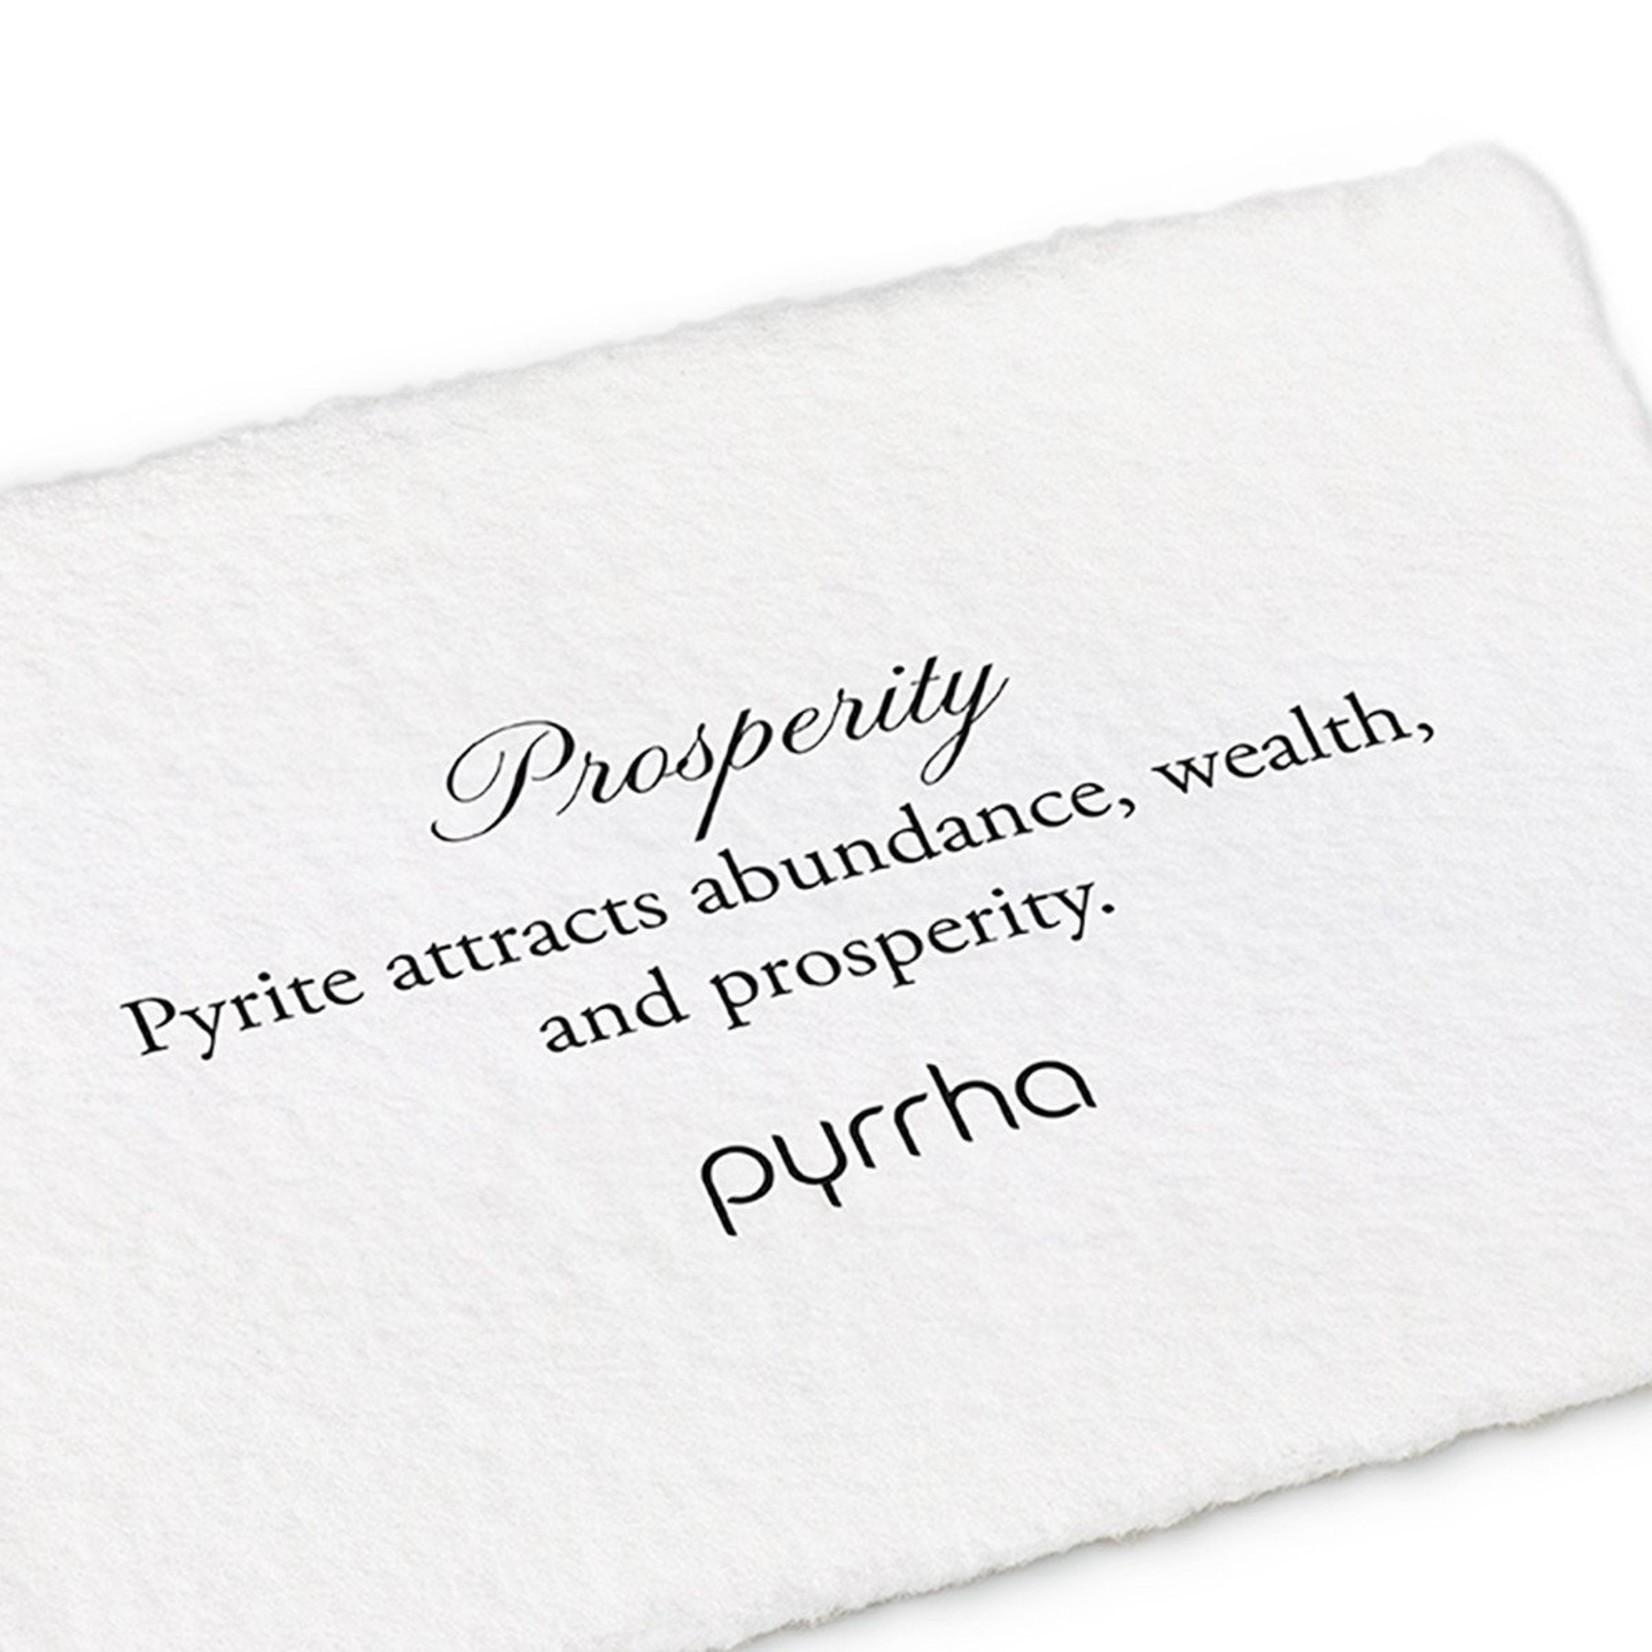 Pyrrha Prosperity Signature Attraction Charm